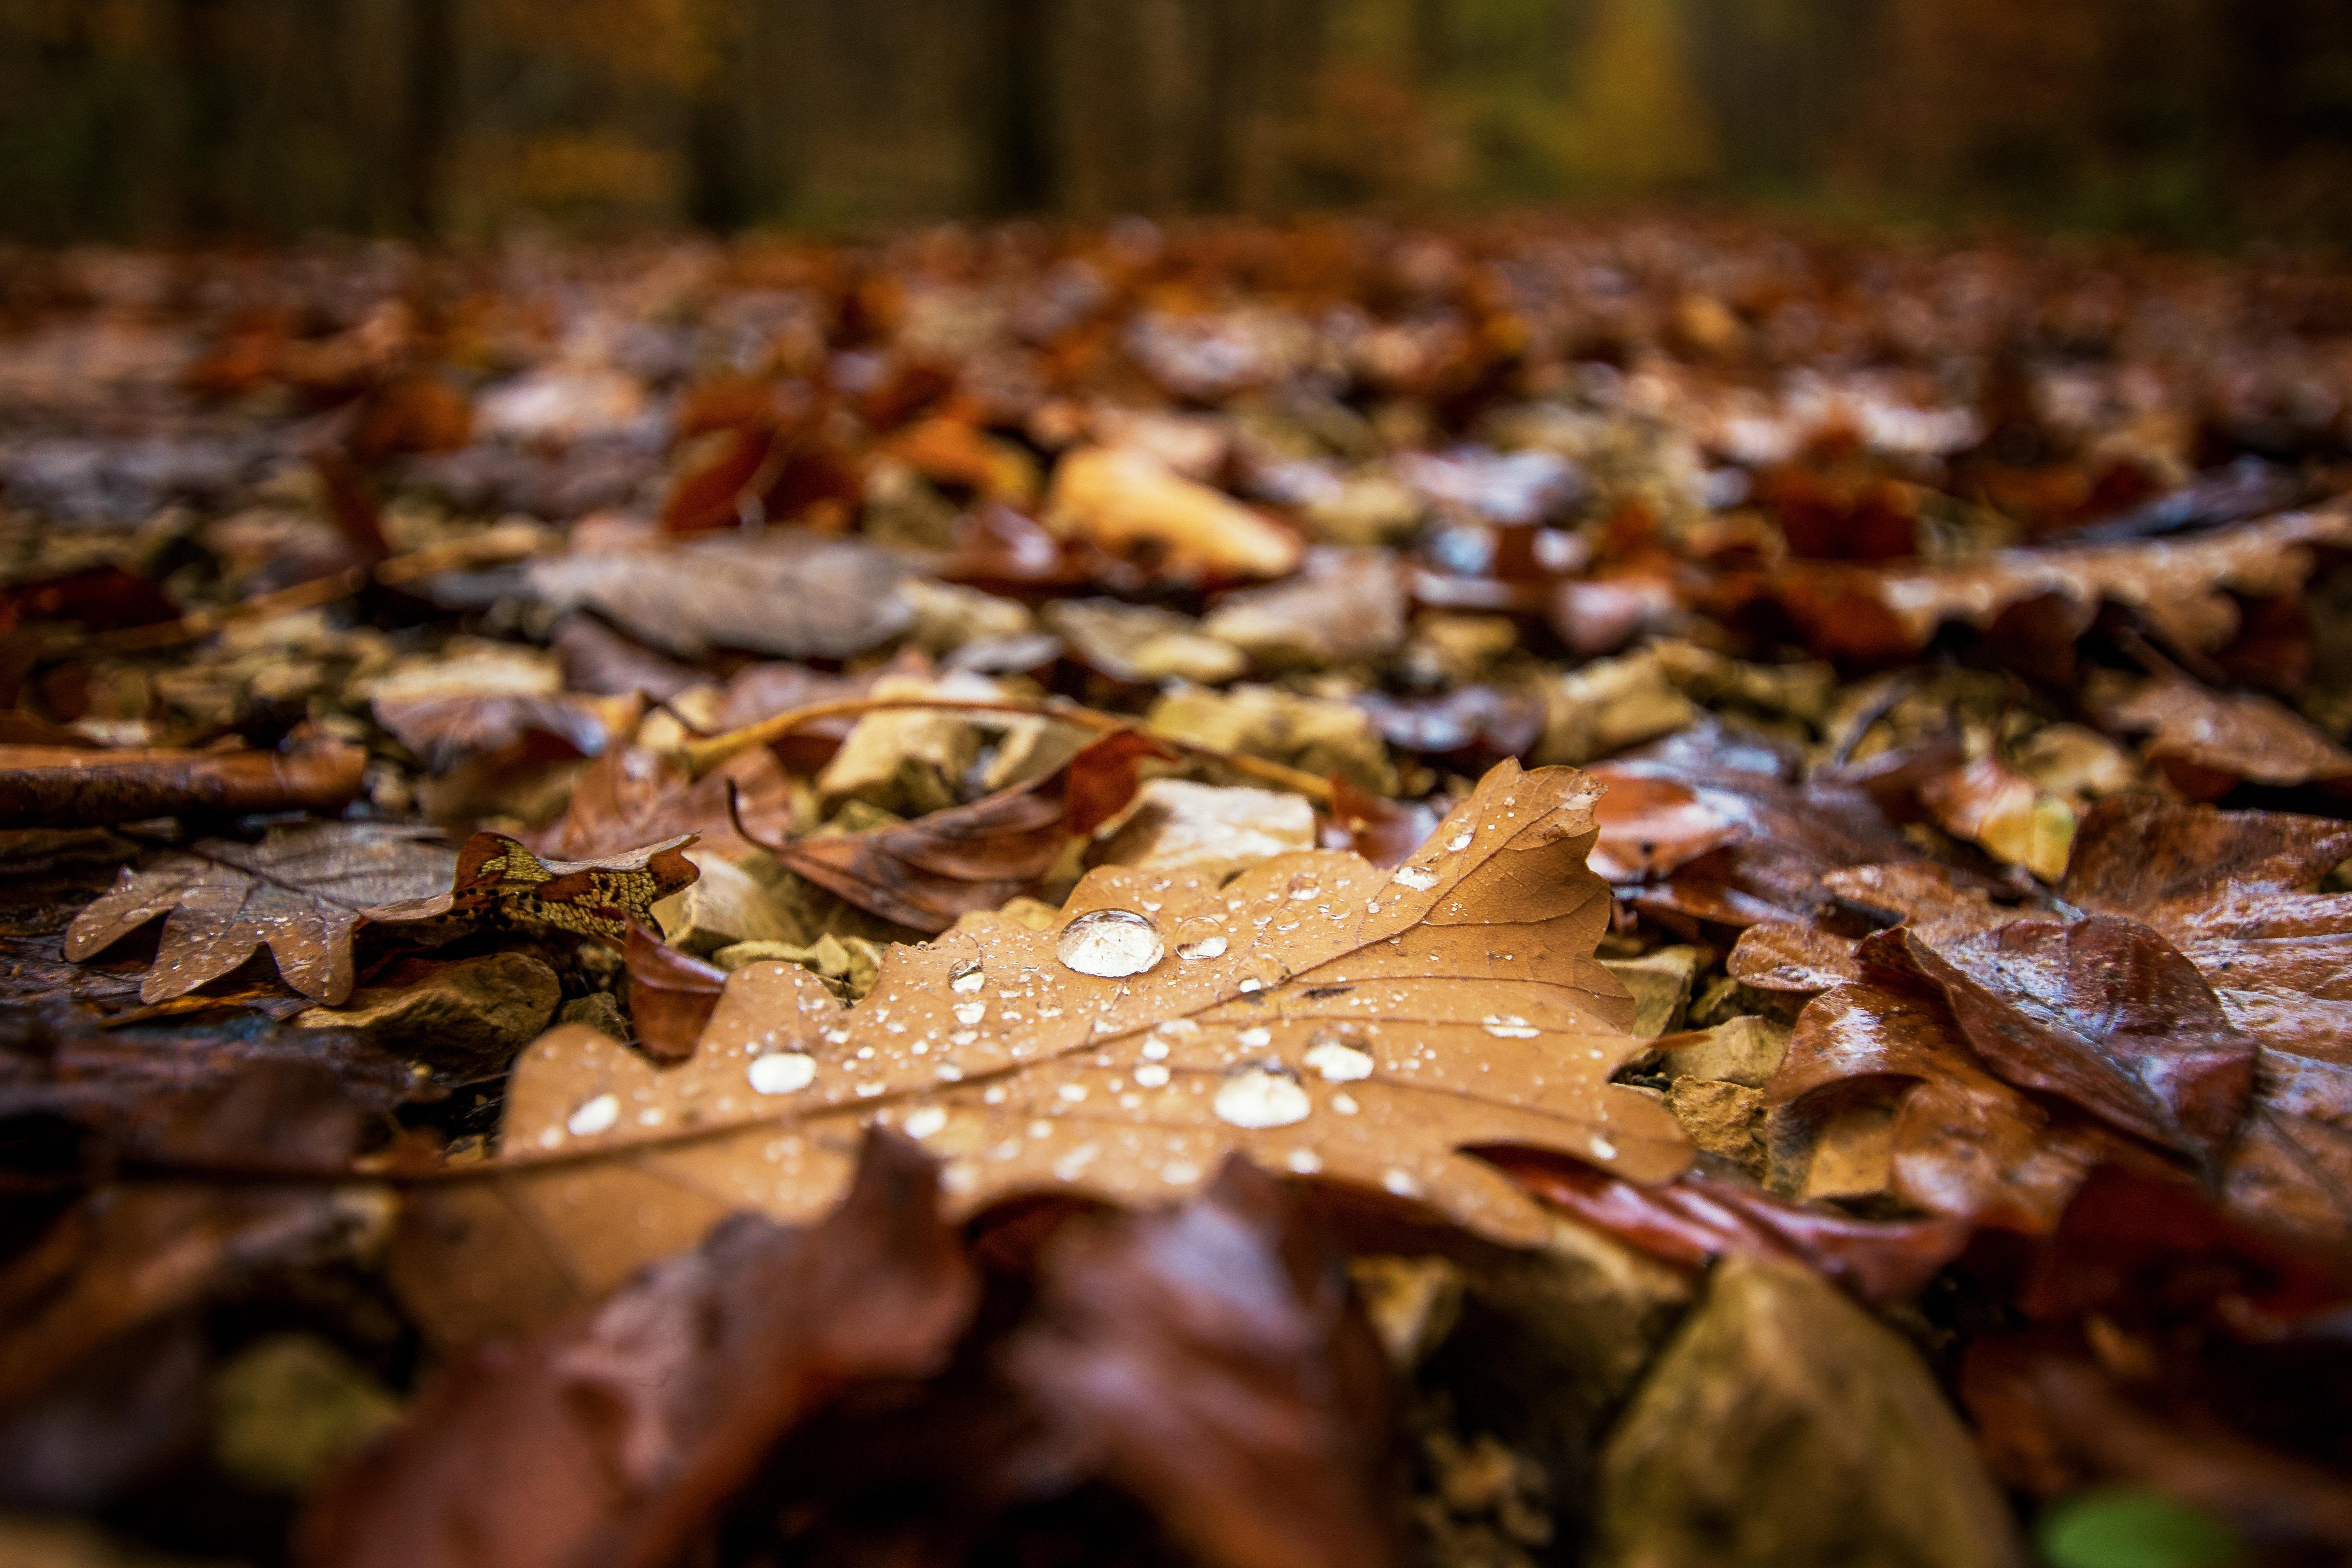 rando inside, randonnée, randonner pluie